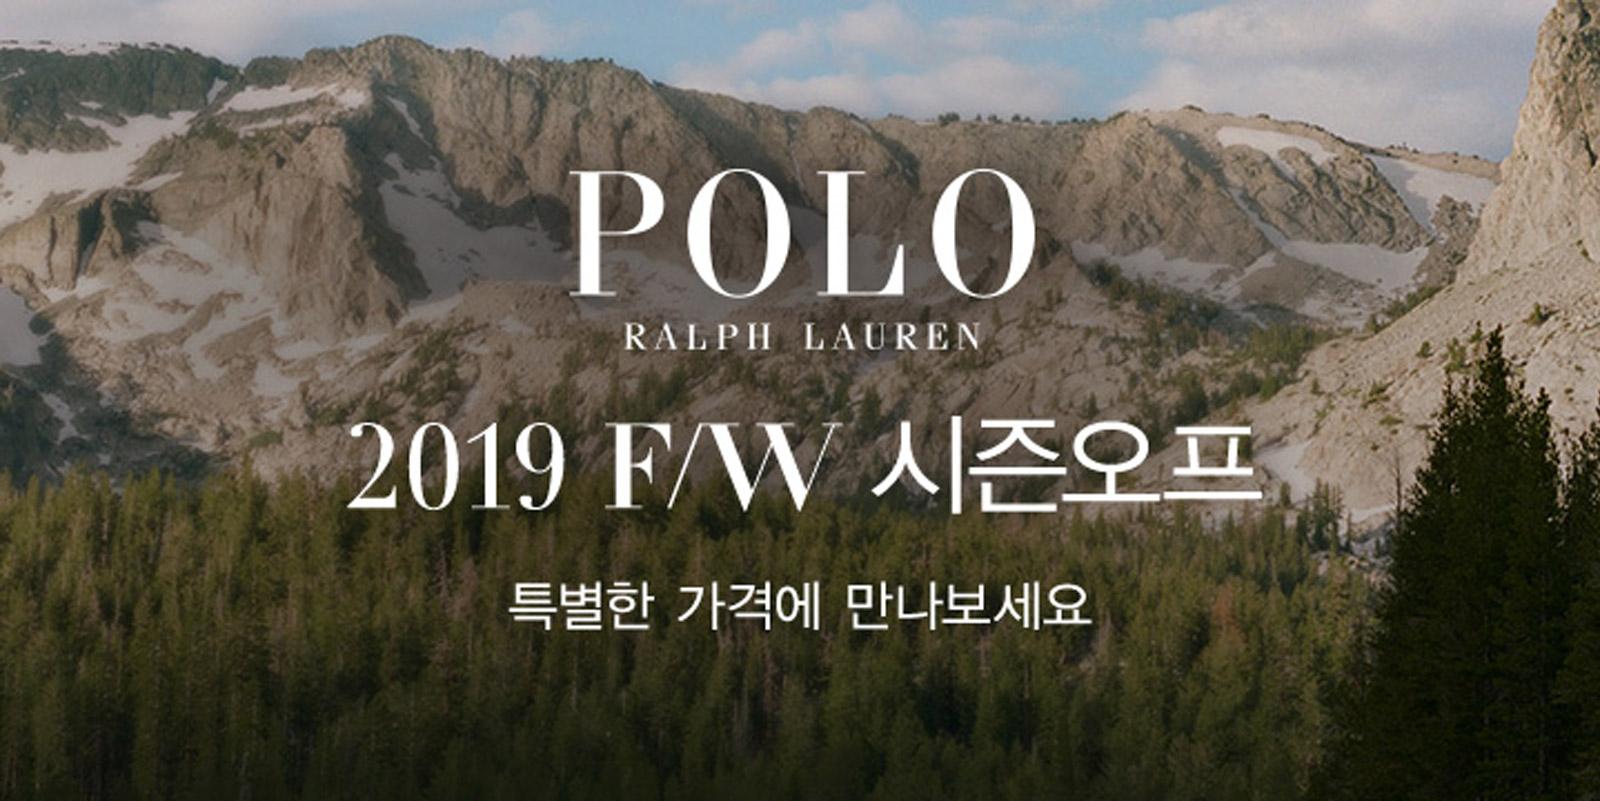 POLO RALPH LAUREN 2019  F/W 시즌오프 특별한 가격에 만나보세요